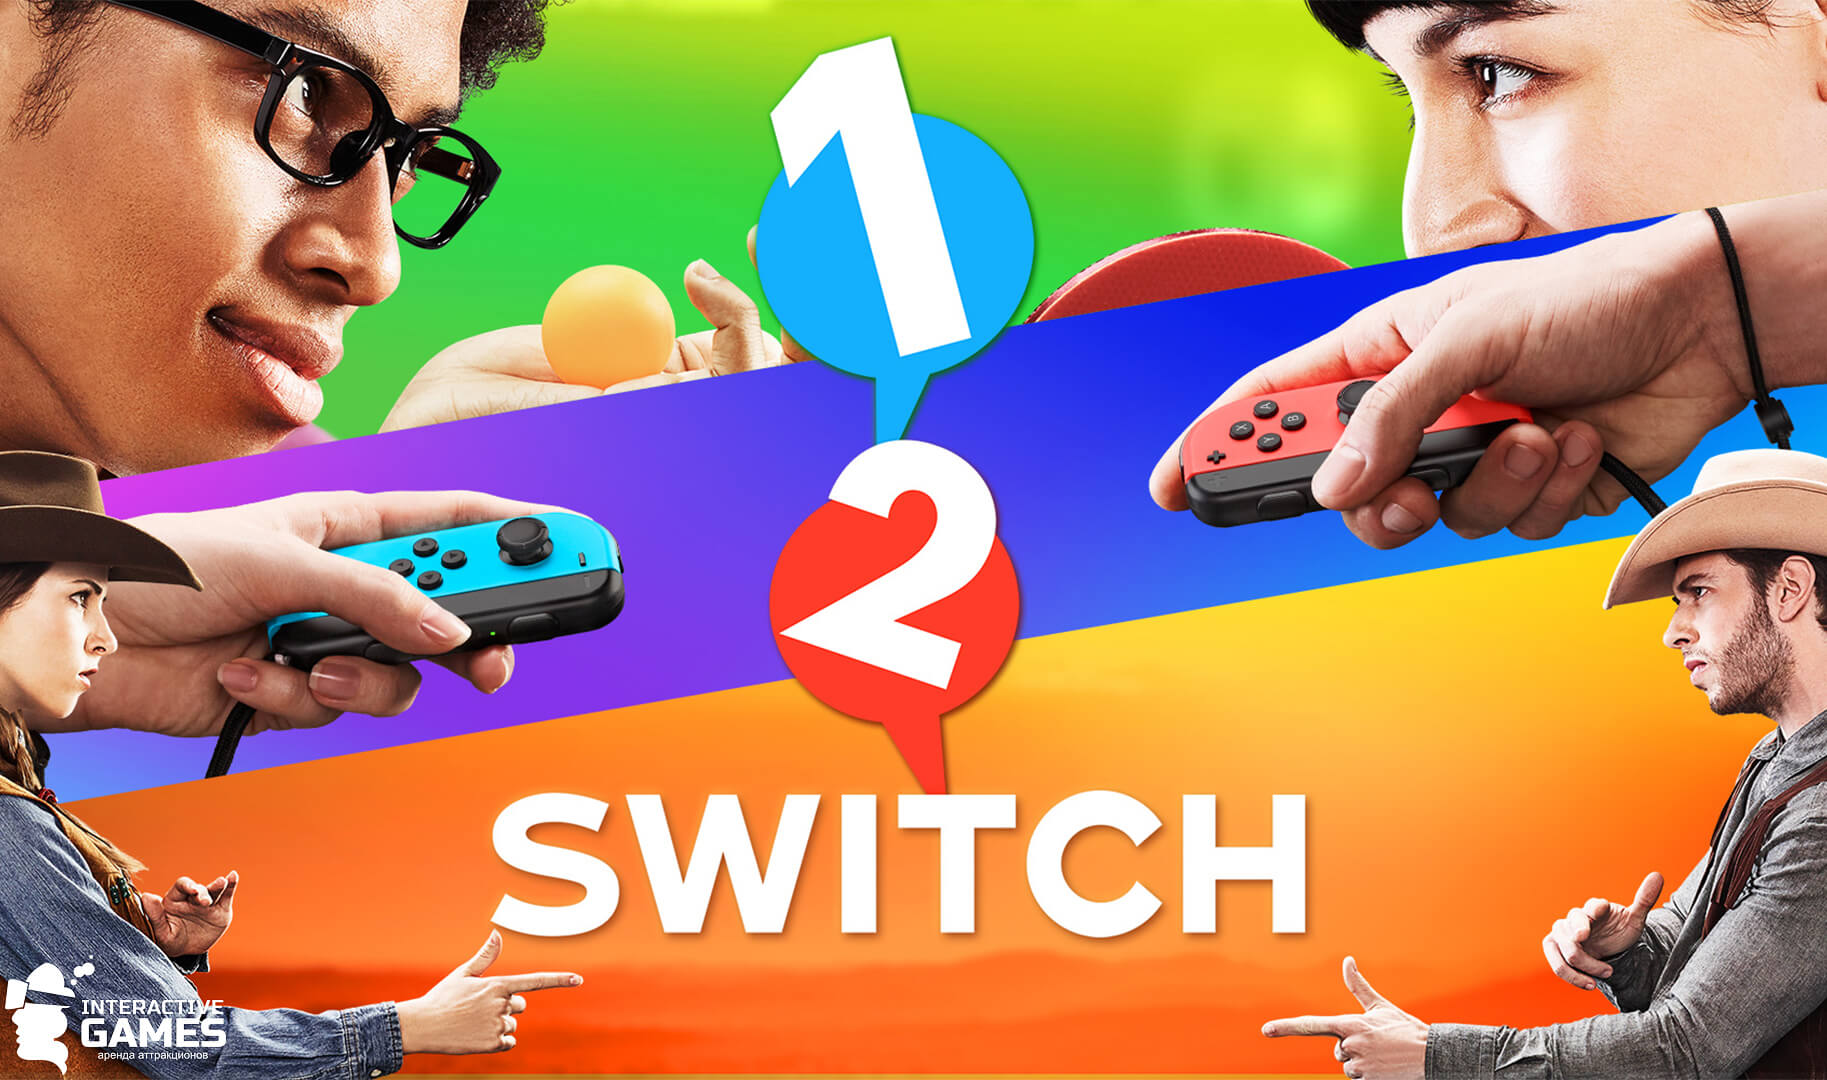 Switch-интерактив